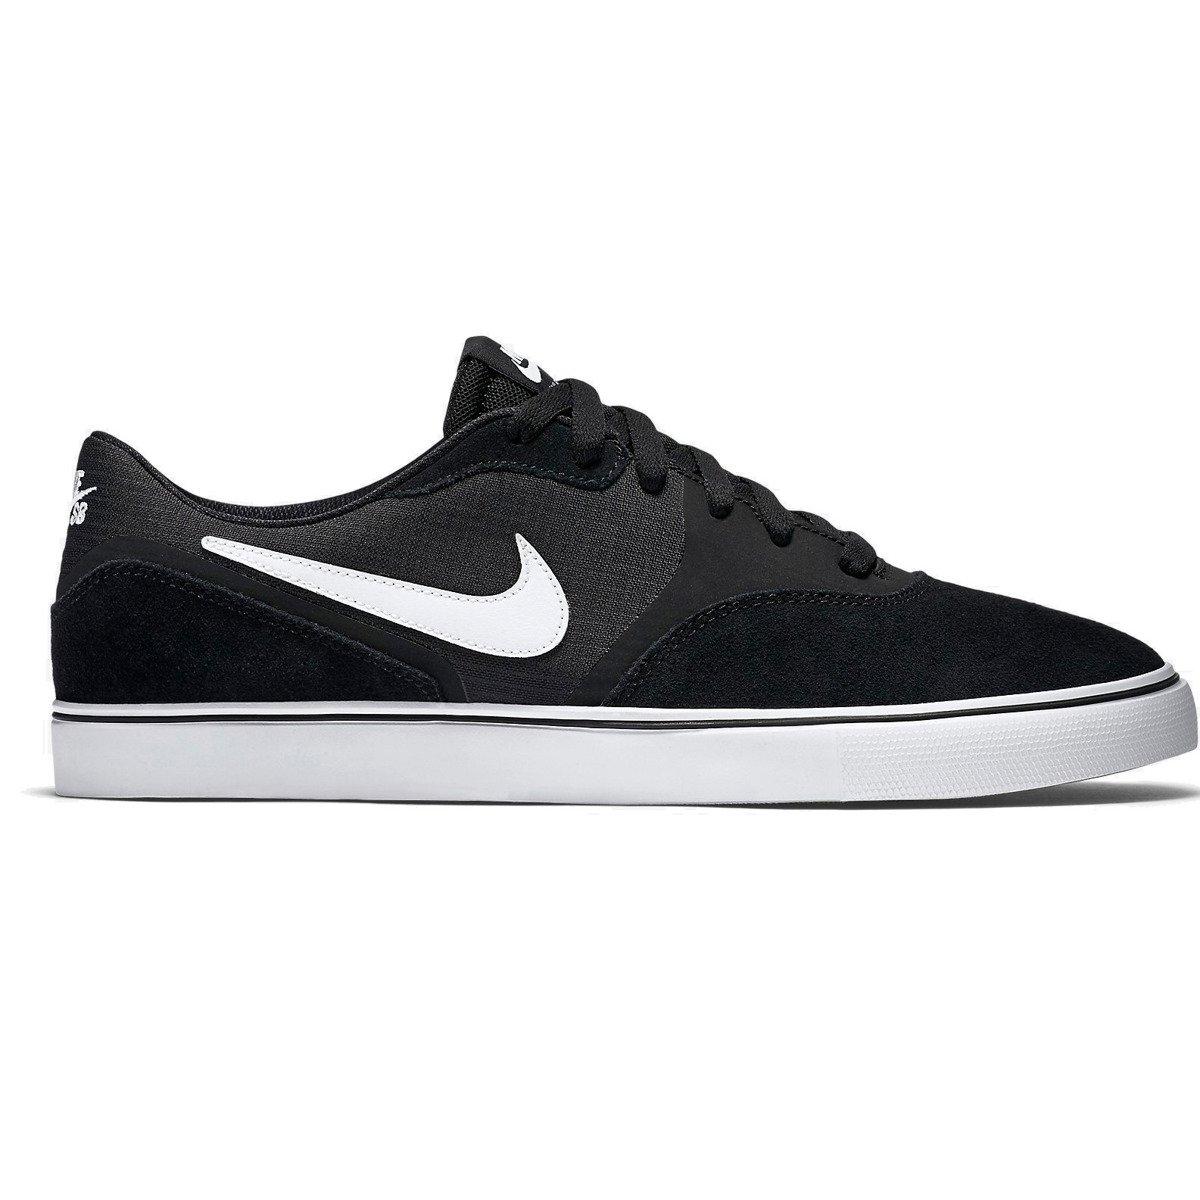 best service 74d81 9a849 Miniramp Skateshop buty nike sb paul rodriguez 9 vr blackwhite-gum light  brown